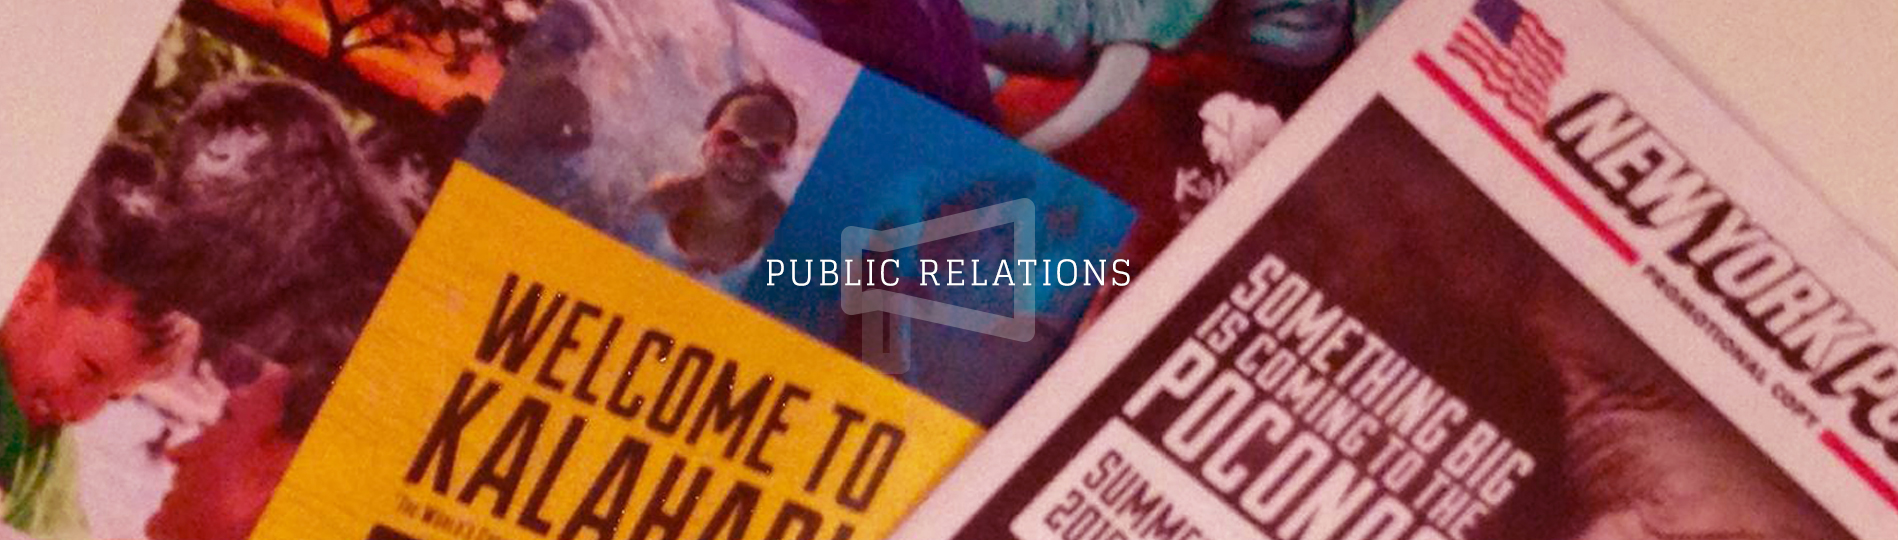 Capabilities_Public-Relations.jpg